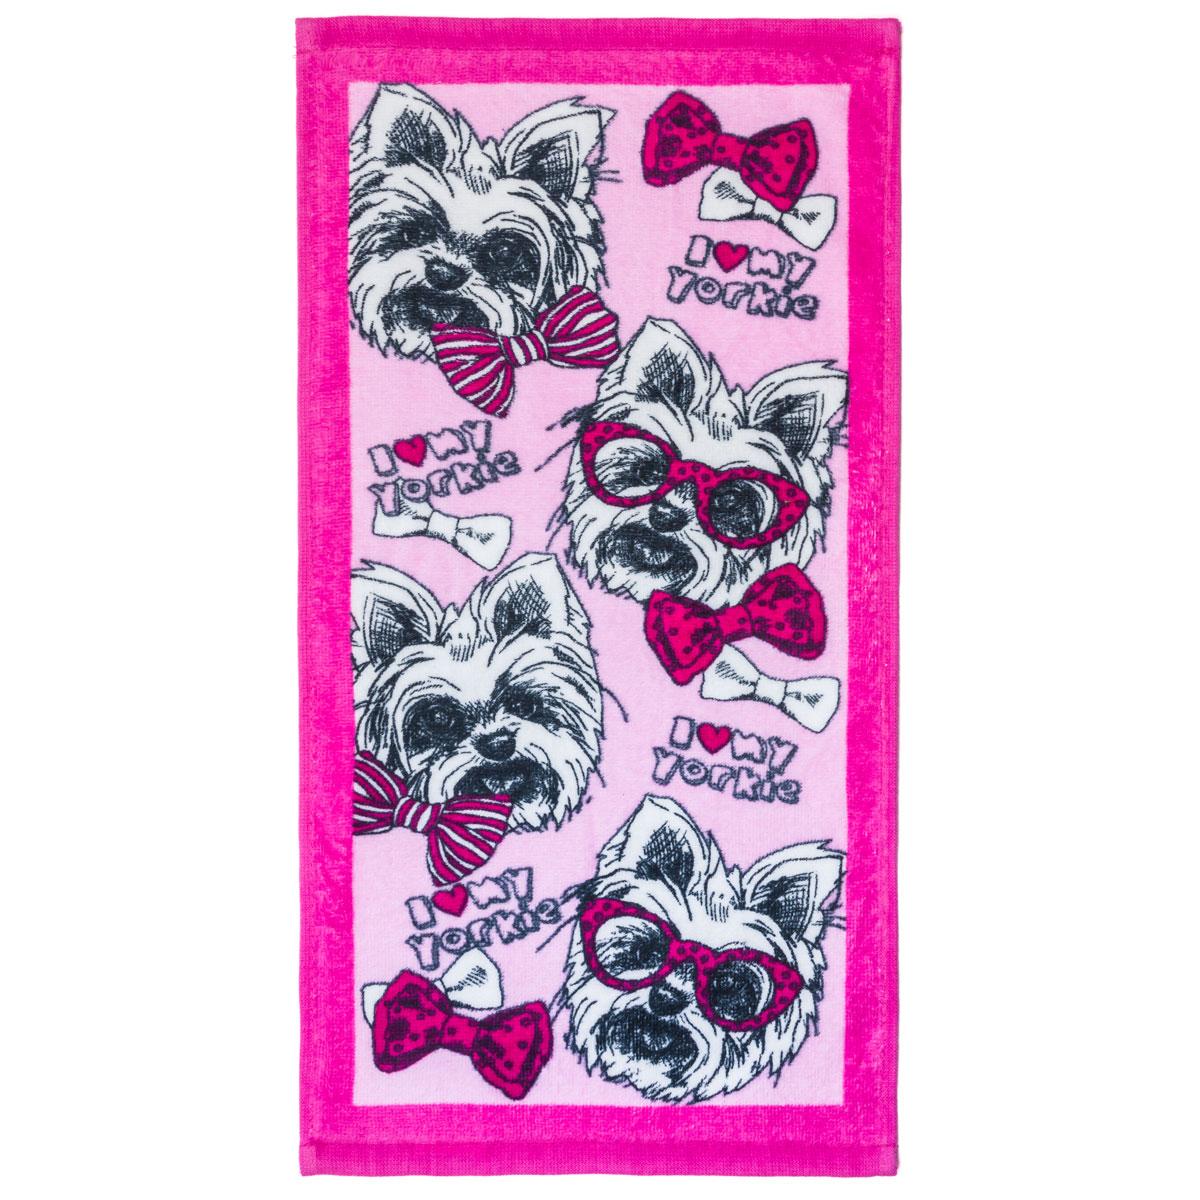 Полотенце арт. 04-0081 Розовый р. 25х50Махровые полотенца<br>Плотность ткани: 330 г/кв. м<br><br>Тип: Полотенце<br>Размер: 25х50<br>Материал: Махра